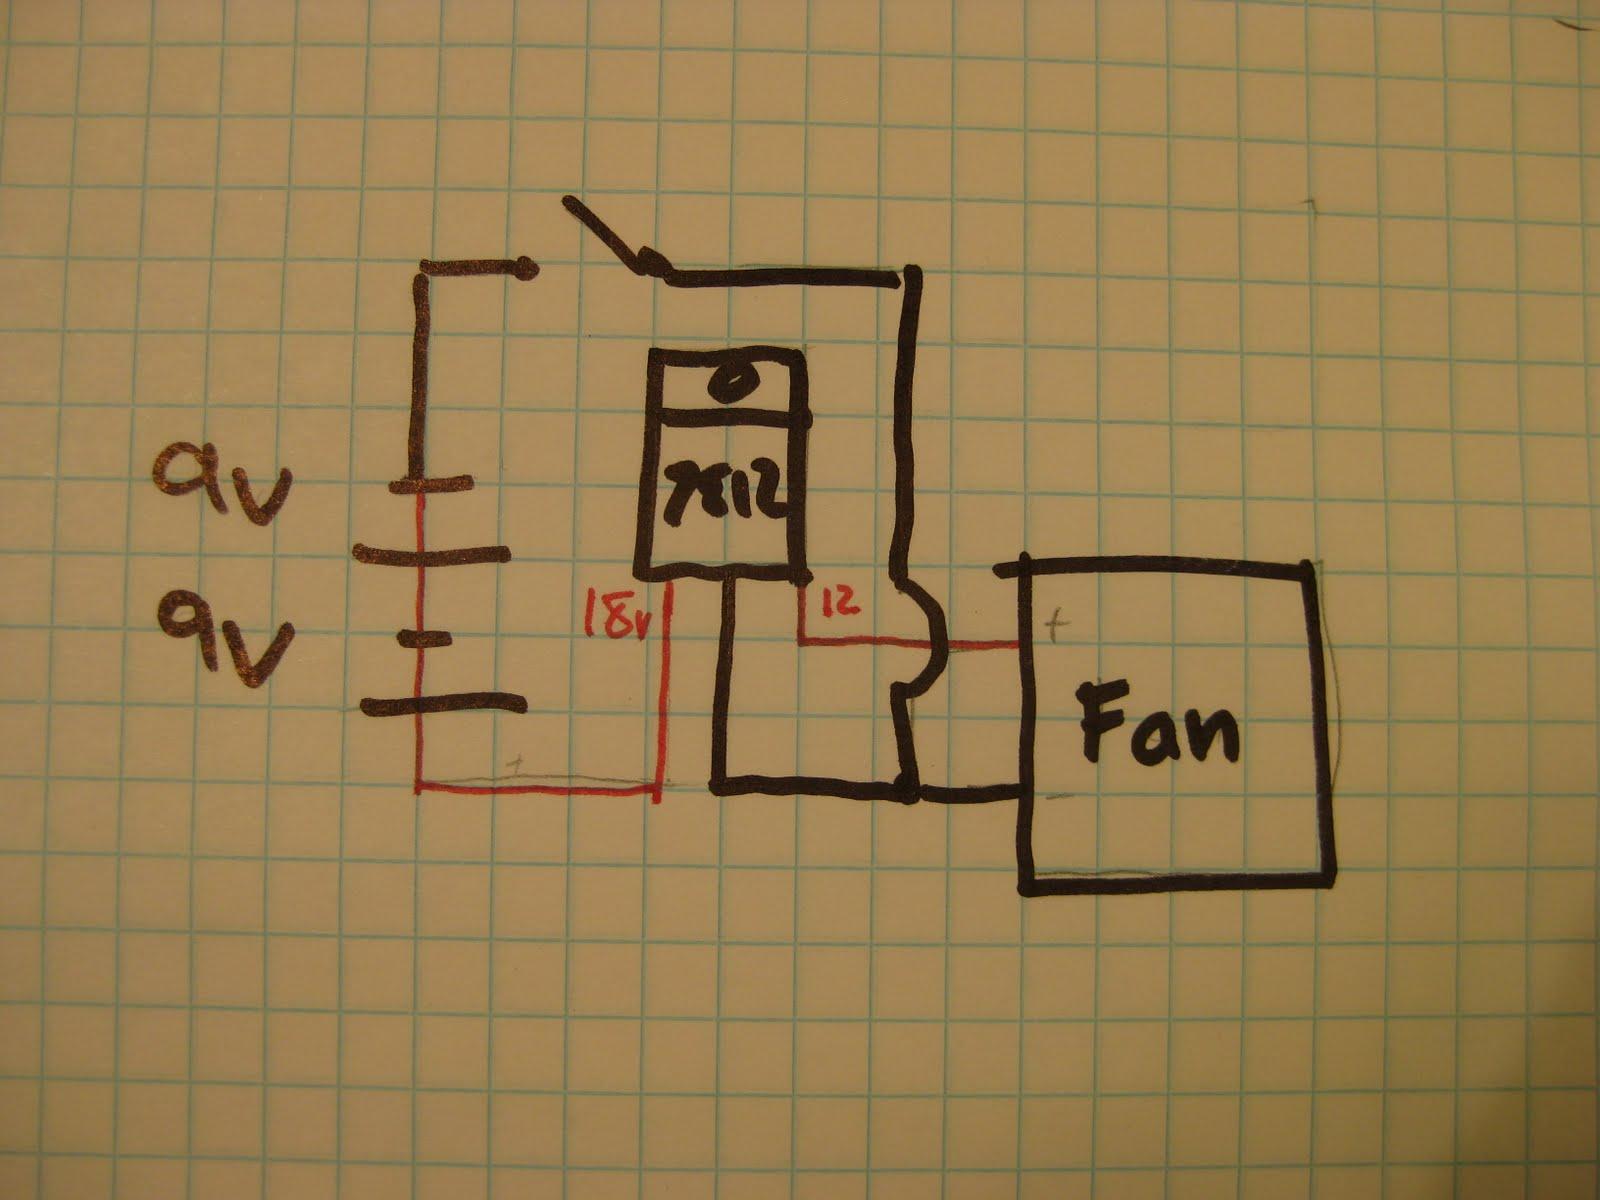 Dremel Wiring Diagram General Wiring Diagram Wiring Diagram - Images on ingersoll rand wiring diagram, norton wiring diagram, rockwell wiring diagram, karcher wiring diagram, graco wiring diagram, metabo wiring diagram, panasonic wiring diagram, sawstop wiring diagram, braun wiring diagram, ace wiring diagram, power tool wiring diagram, apc wiring diagram, atlas wiring diagram, bandsaw wiring diagram, devilbiss wiring diagram, toshiba wiring diagram, general wiring diagram, schlage wiring diagram, punch wiring diagram, samsung wiring diagram,